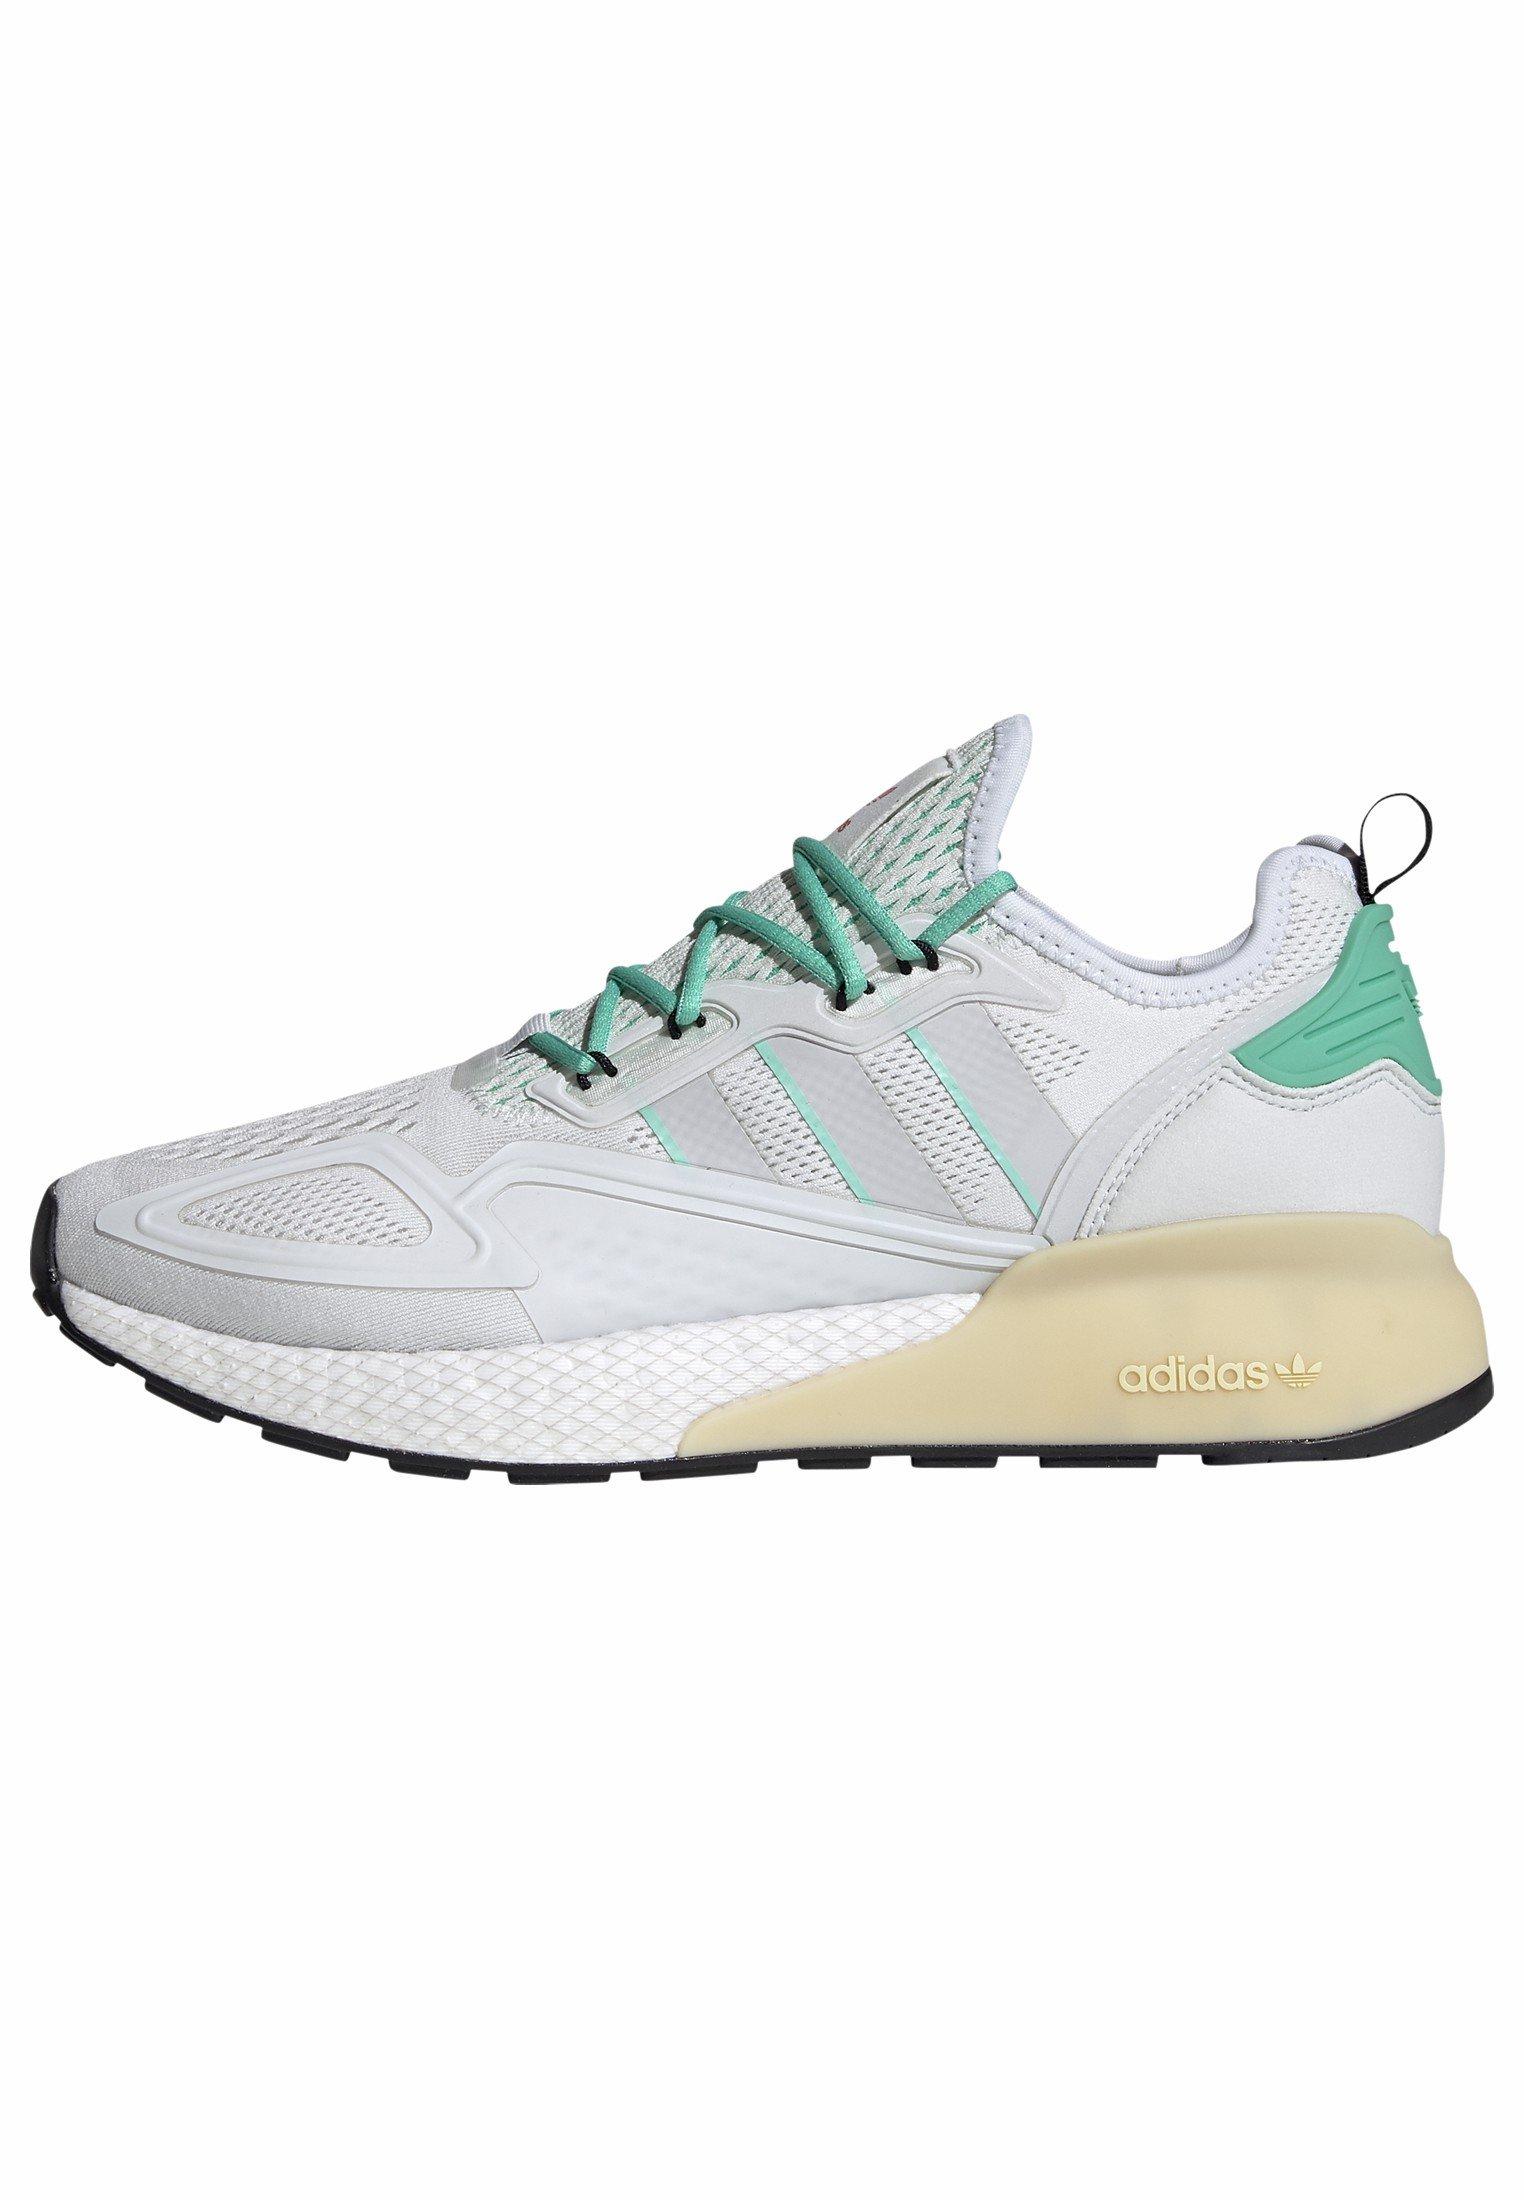 adidas Originals ZX 2K BOOST - Sneakers basse - white/grey/ green | Scarpe Sconto